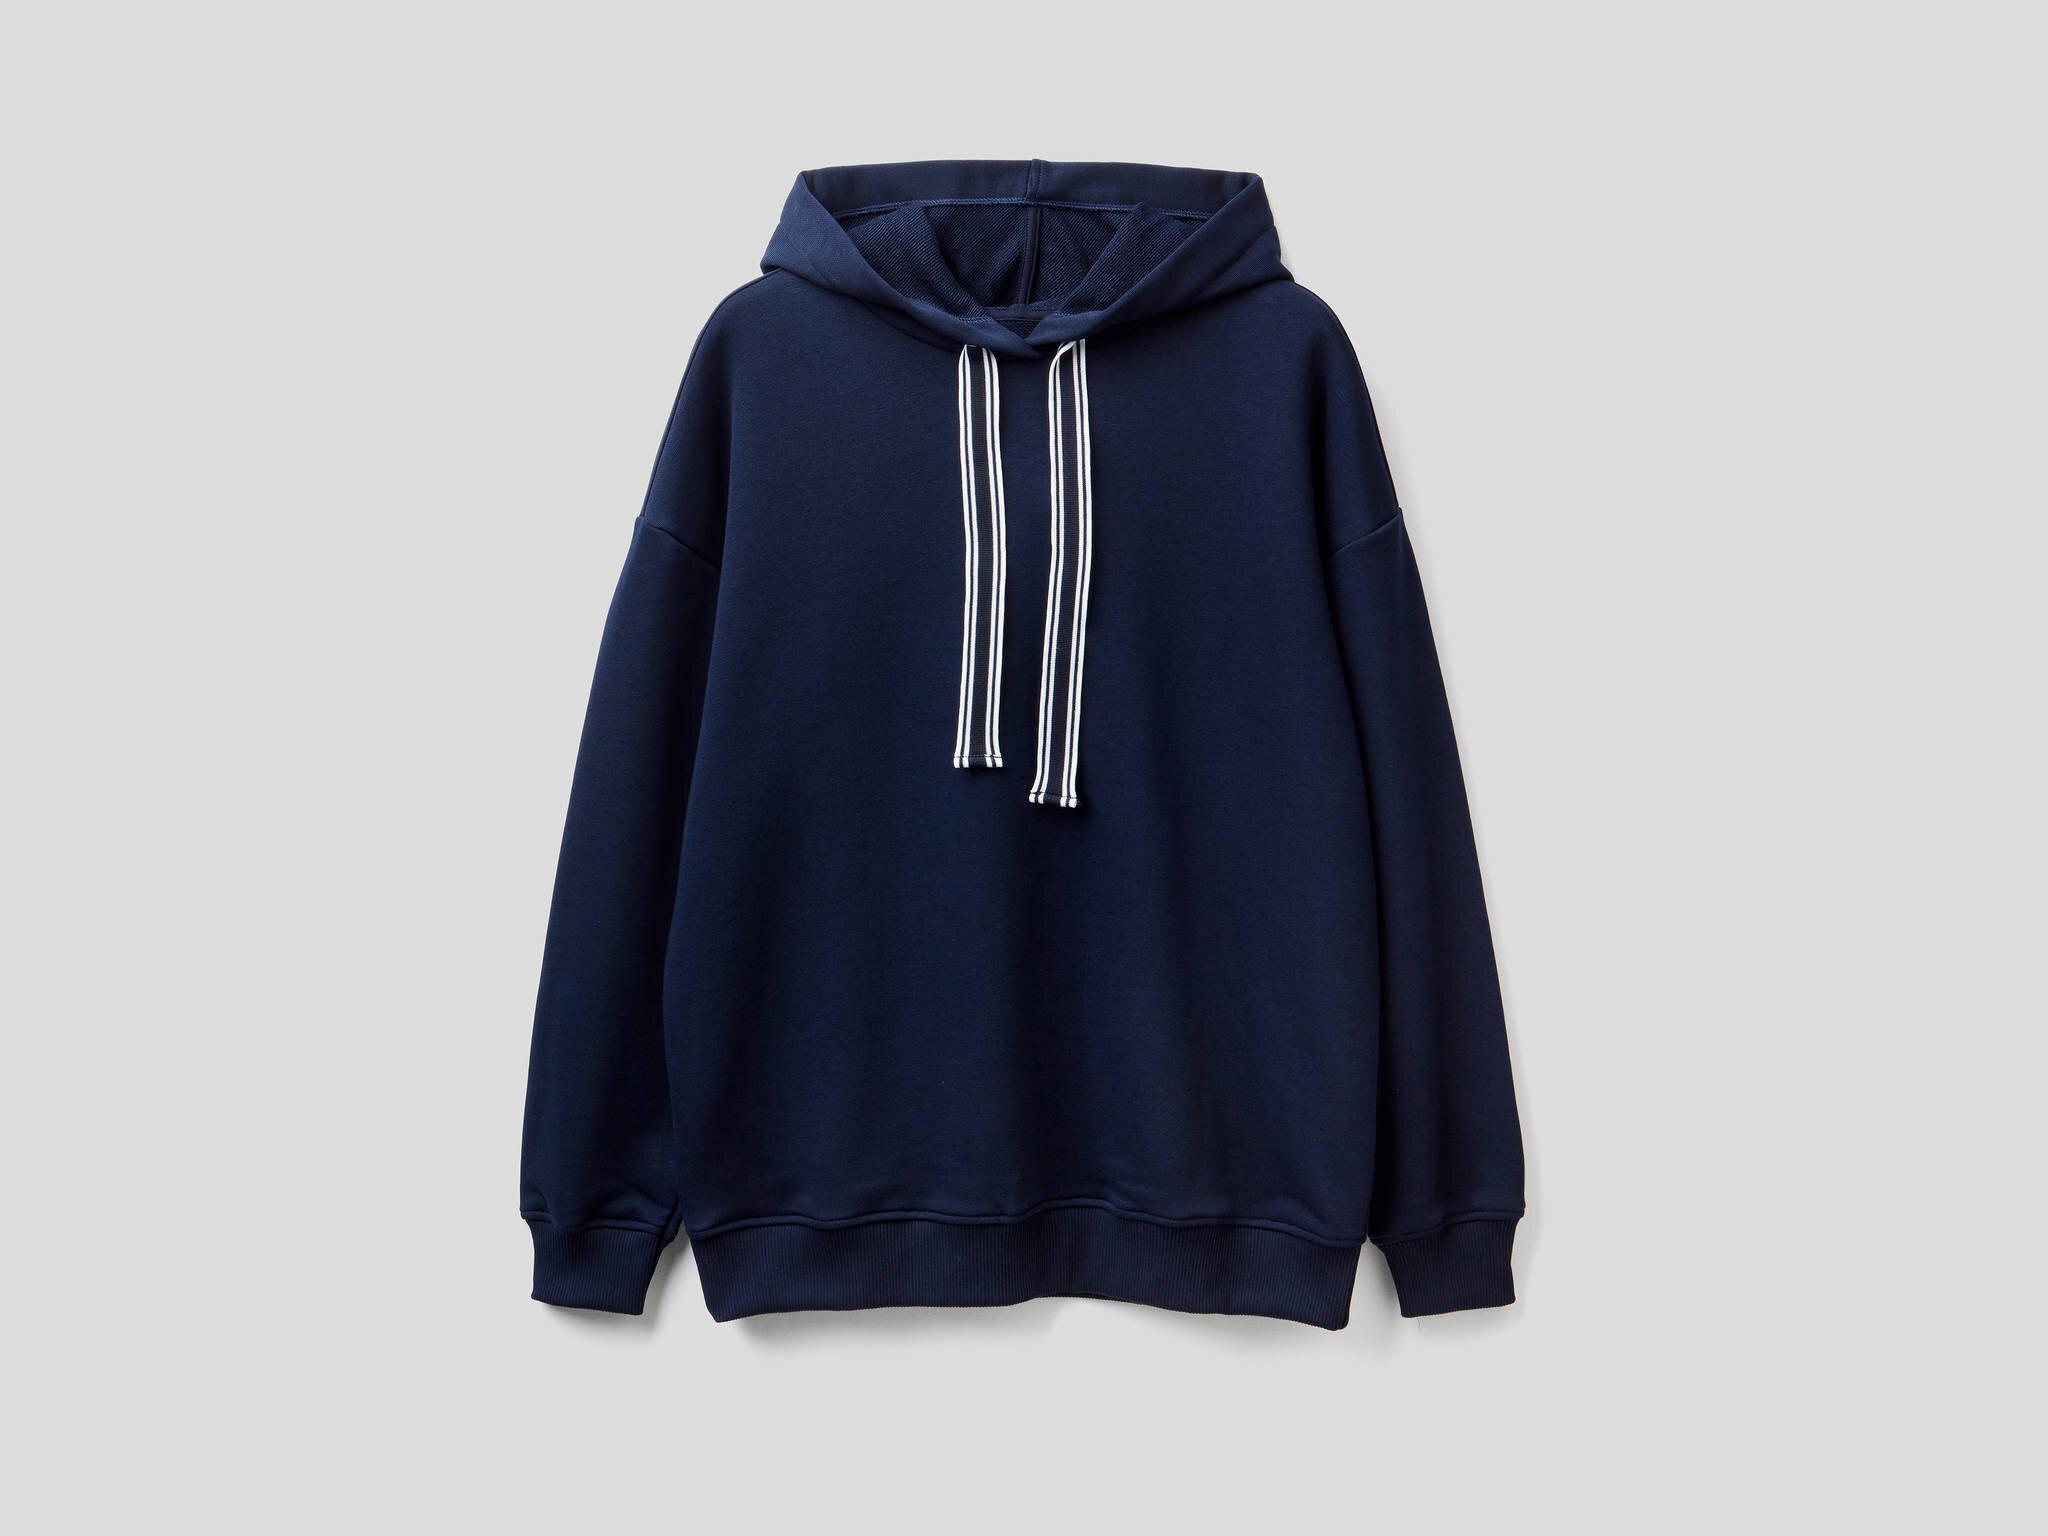 Kapüşonlu Uzun Sweatshirt